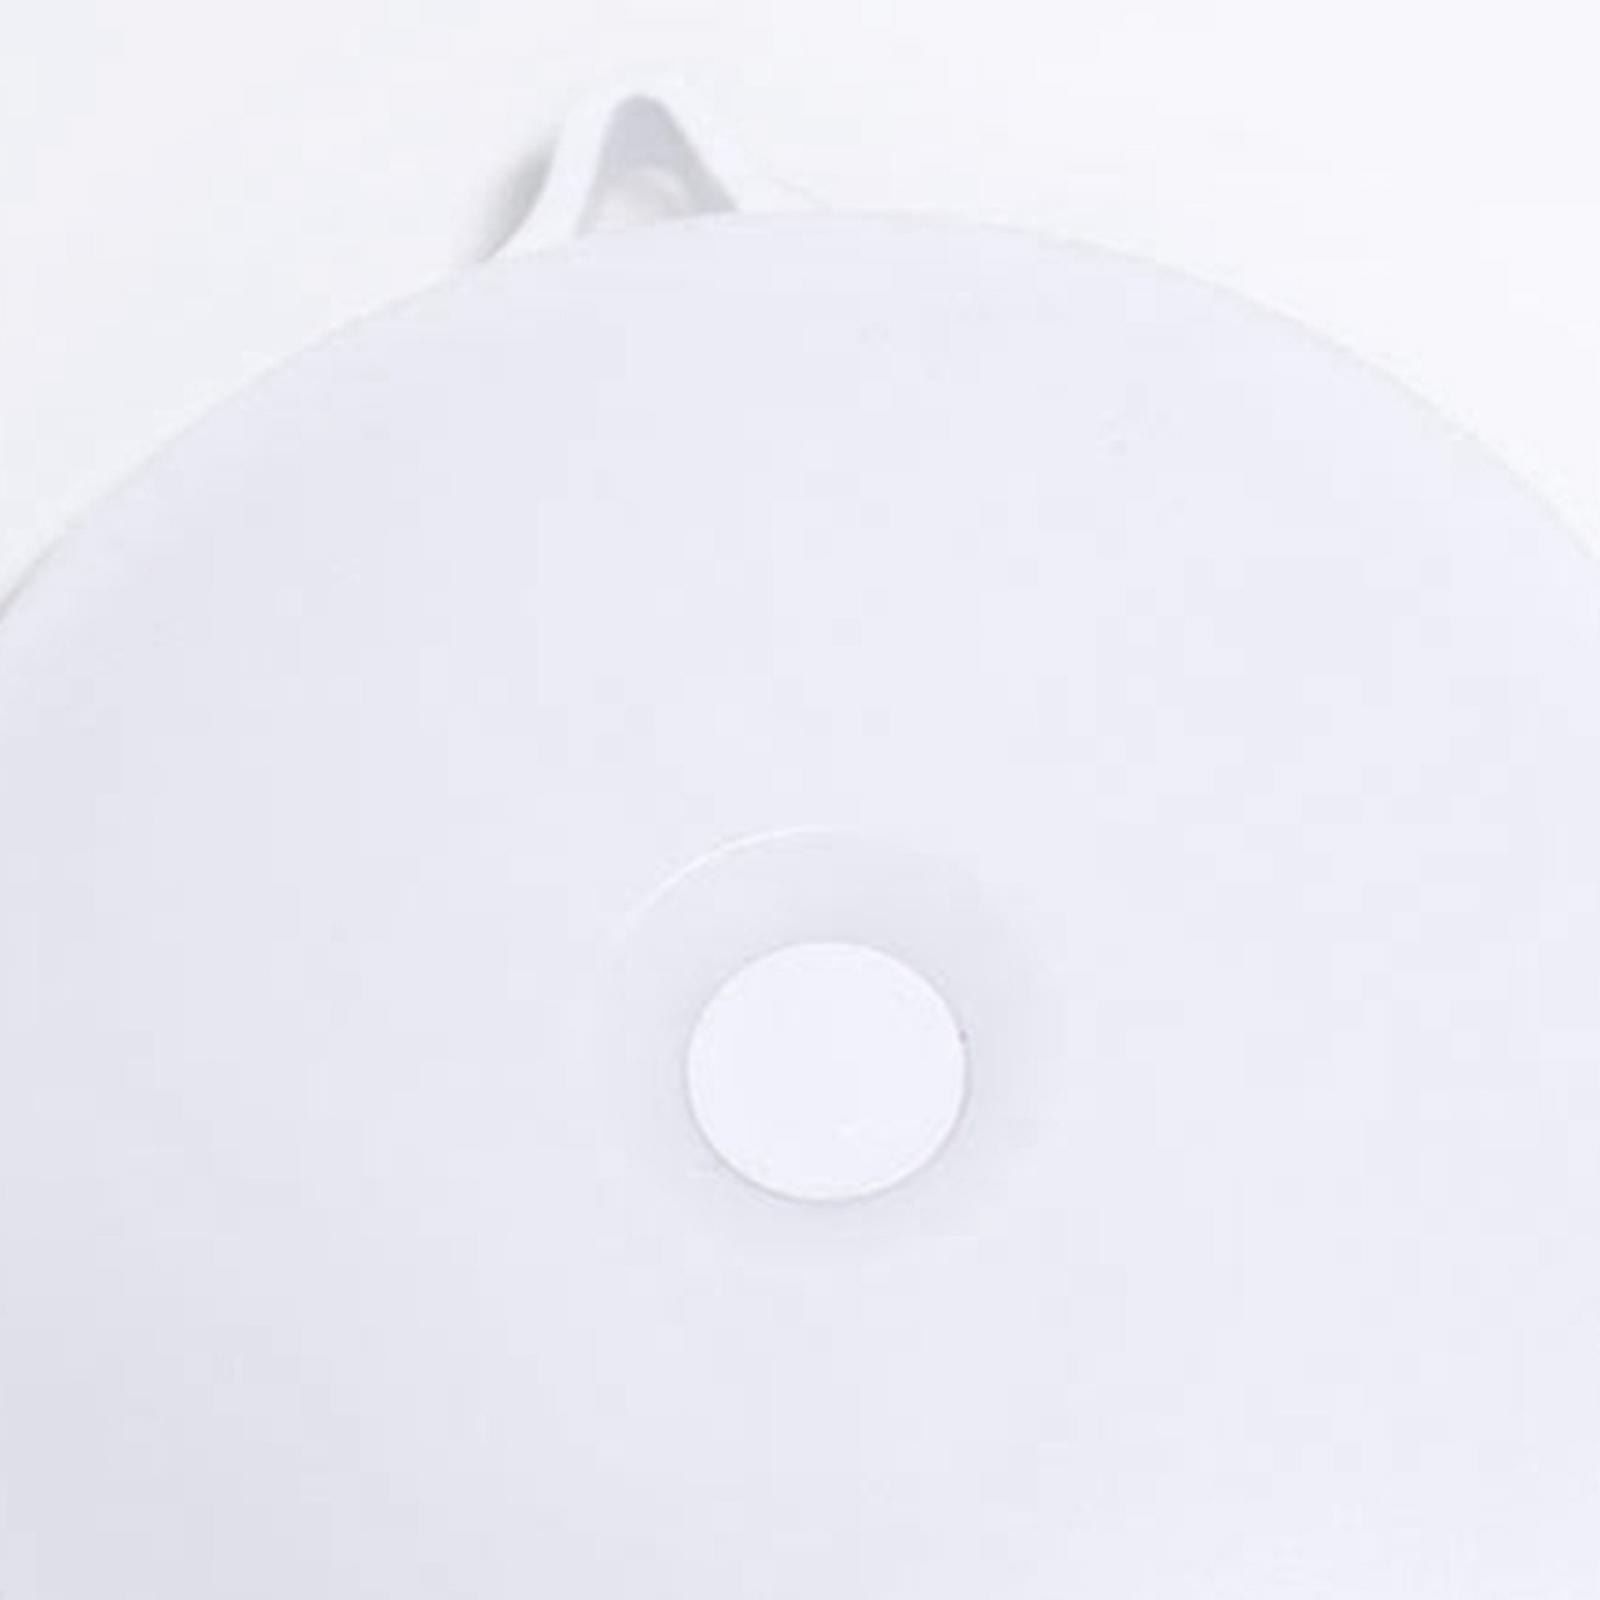 miniatura 20 - Luce notturna a LED per camera da letto ricaricabile USB per Hotel con sensore